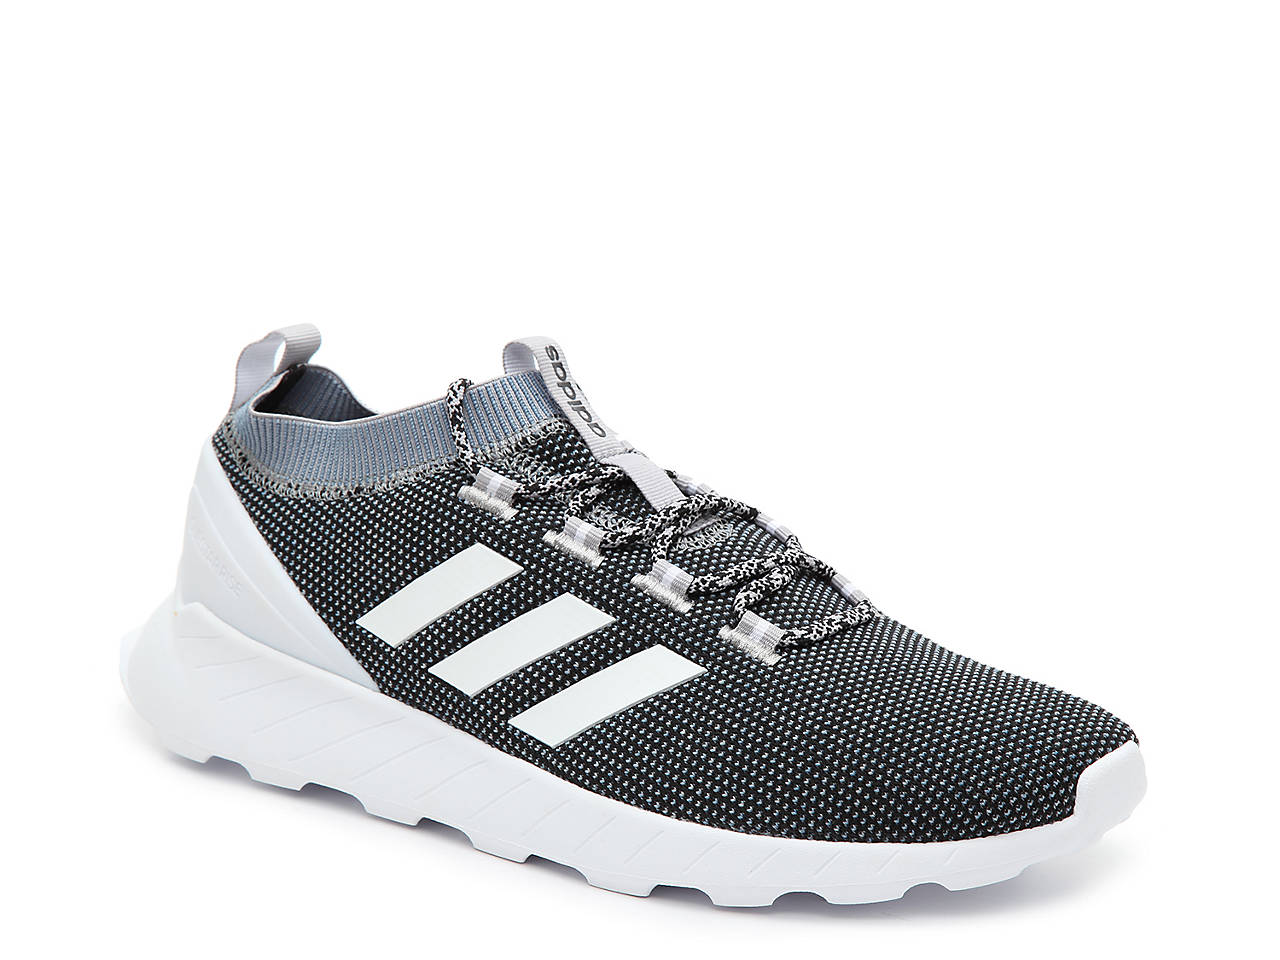 2ee9e6add26 adidas Questar Rise Sneaker - Men s Men s Shoes